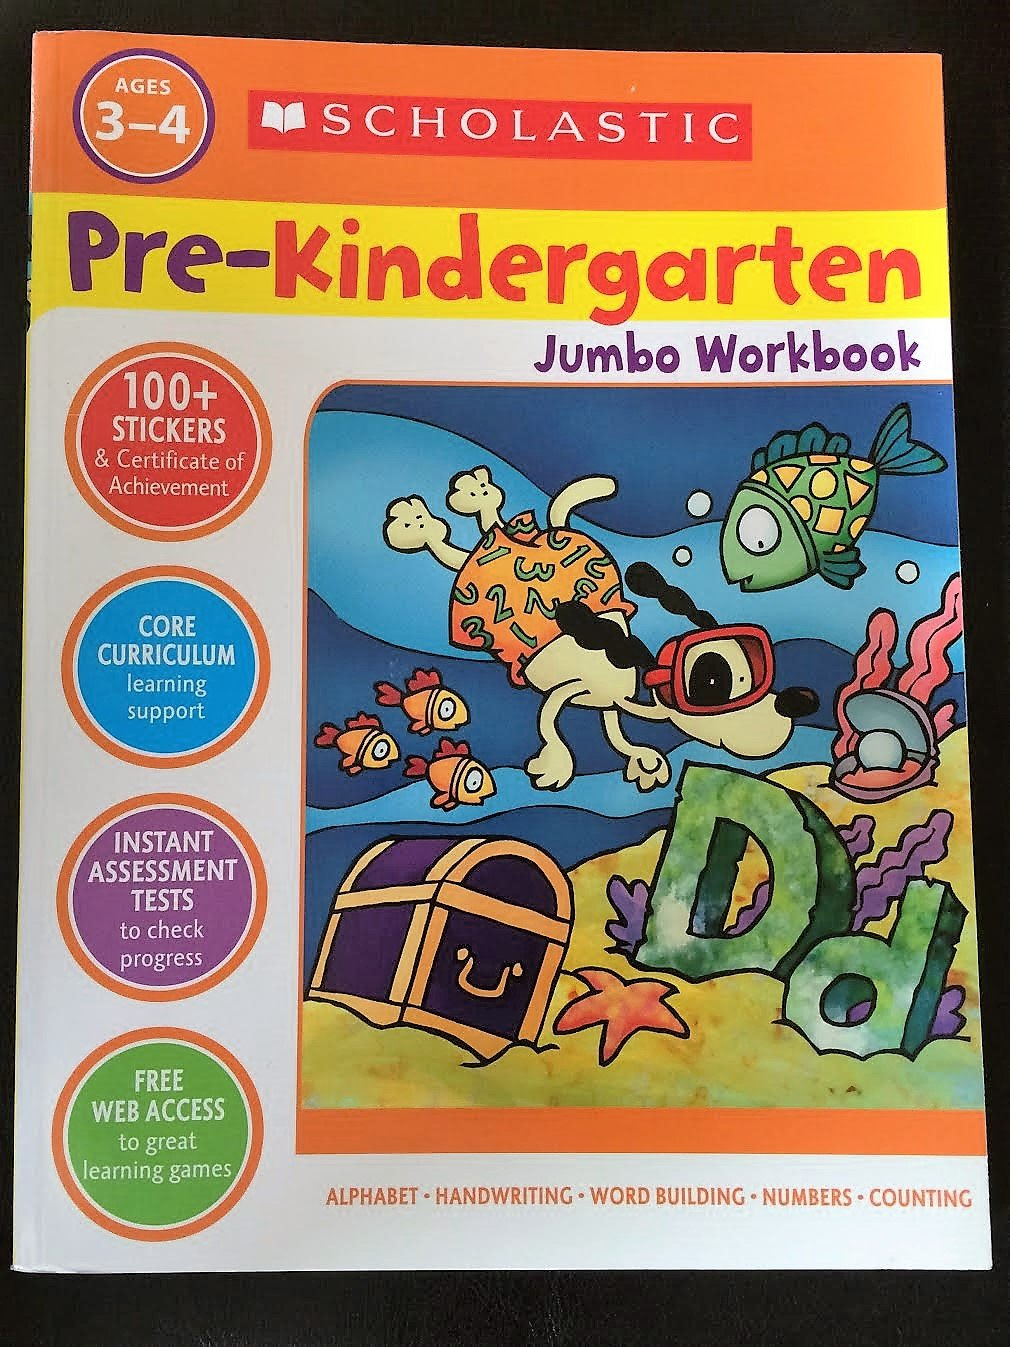 Workbooks pre k workbooks : Scholastic Pre-Kindergarten Jumbo Workbook: 9780545648899: Amazon ...